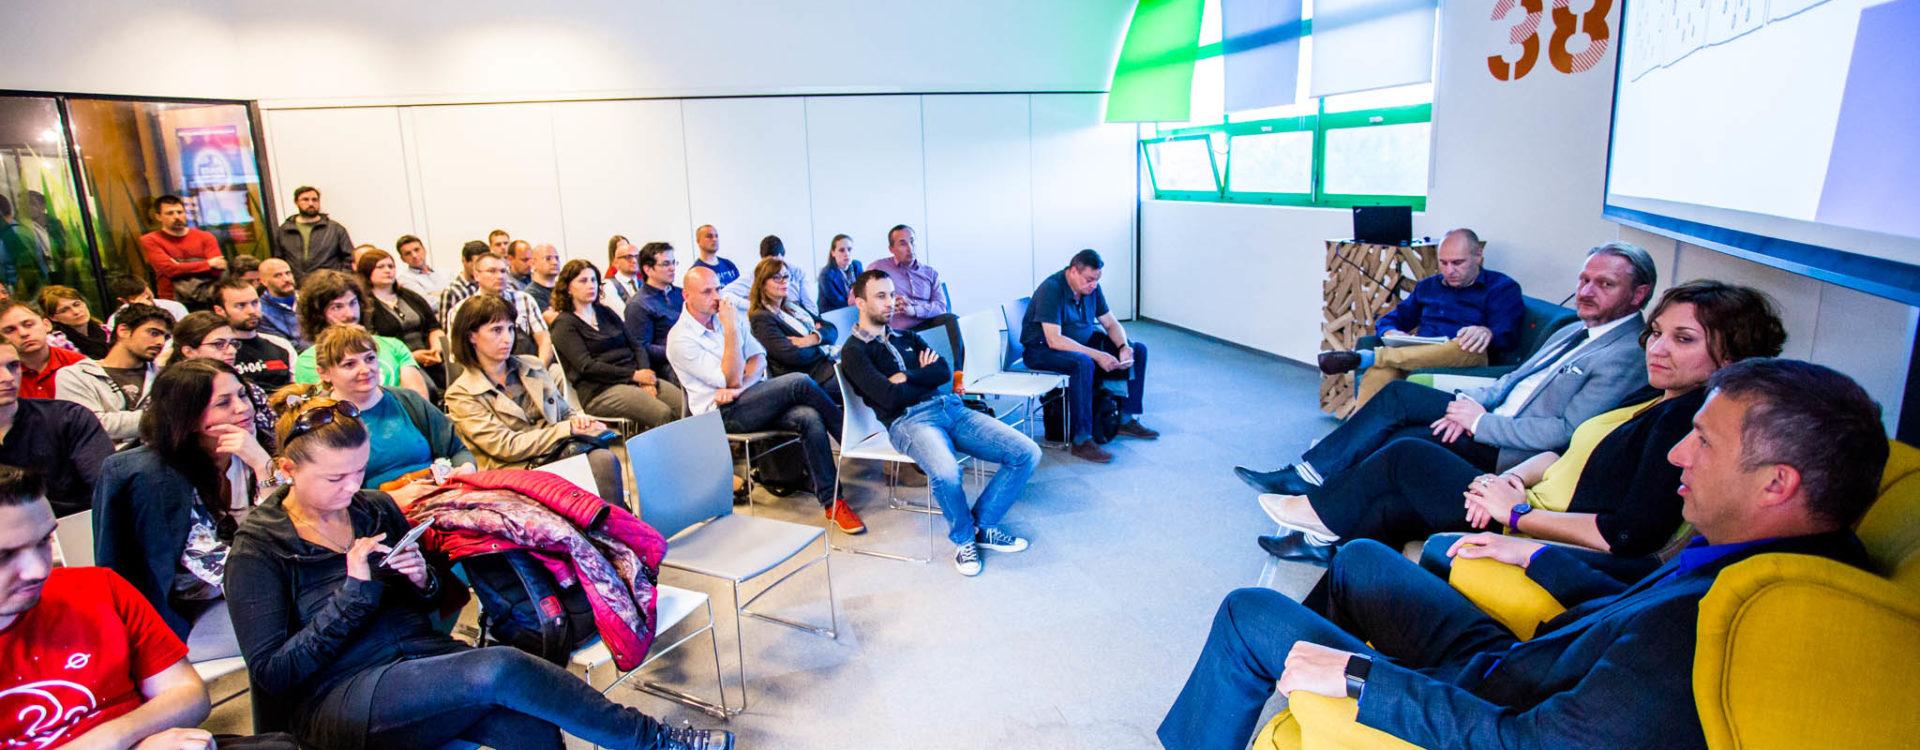 Data Science Economy Meetups